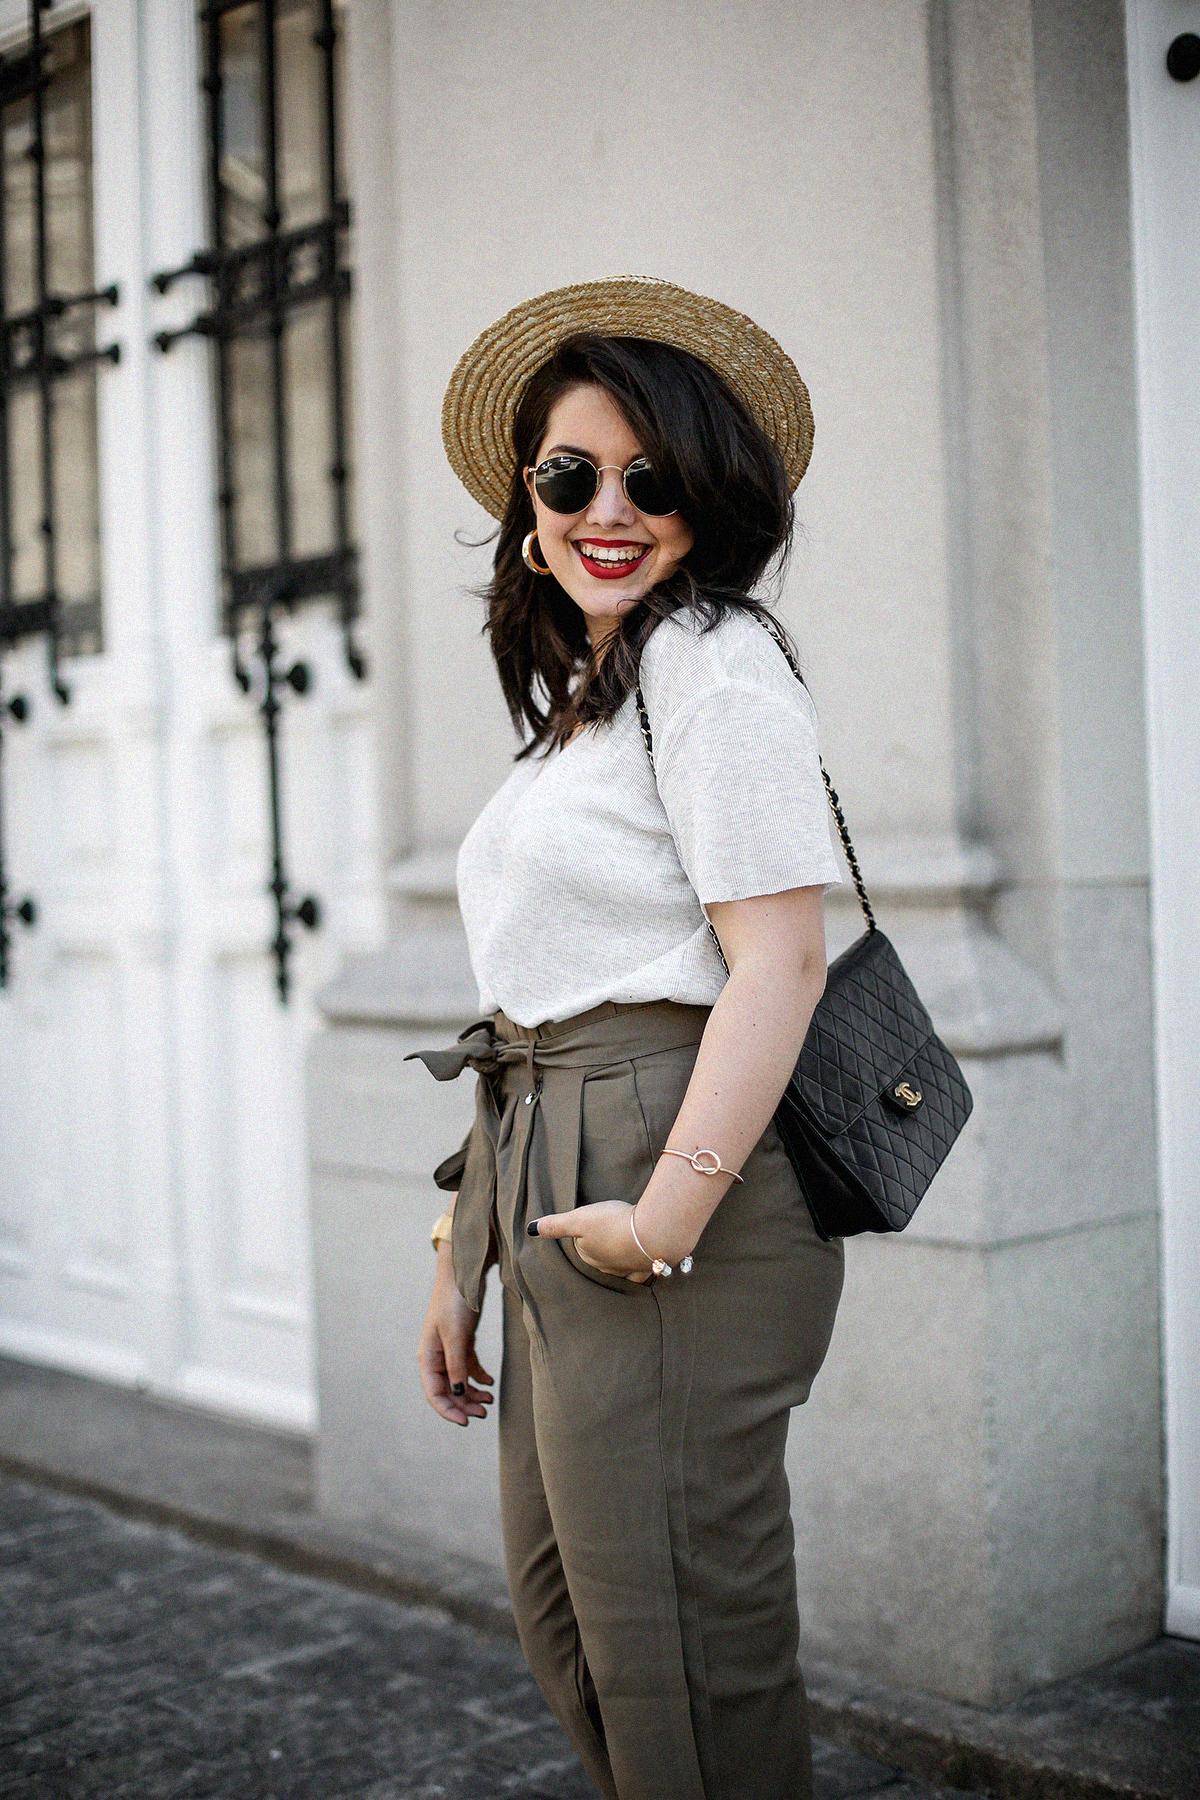 pantalones-verdes-altos-palas-borlas-zara-canotier-look-myblueberrynightsblog16